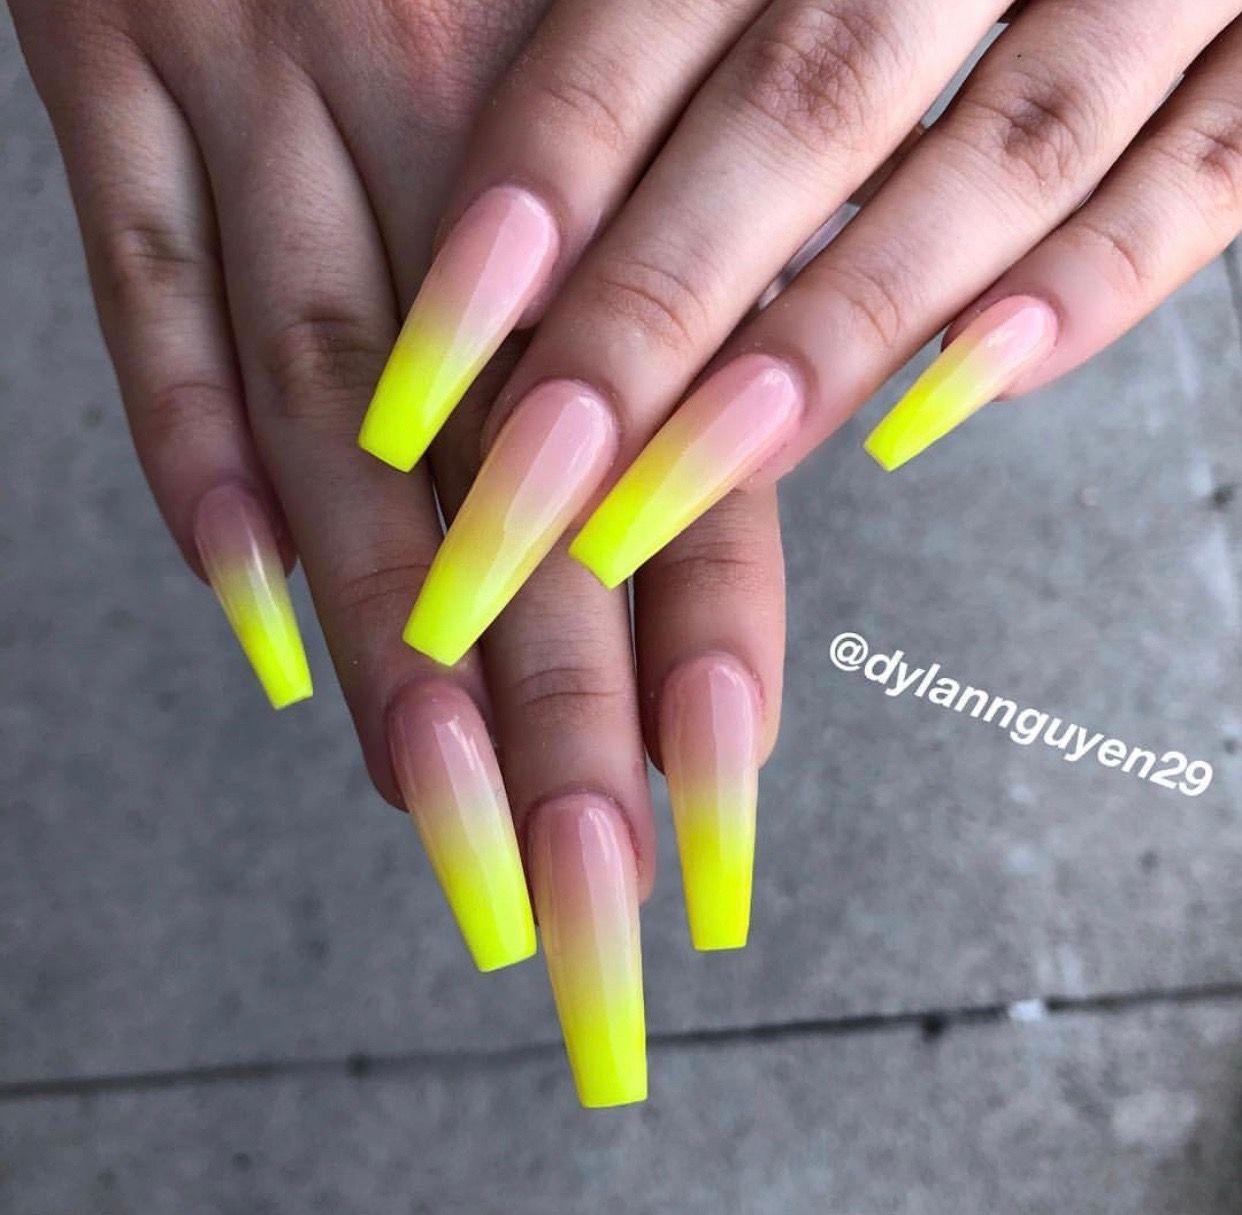 Pin by Kaylia on Nail Tech Ideas & More | French tip nail designs, French tip nails, Nail tip ...